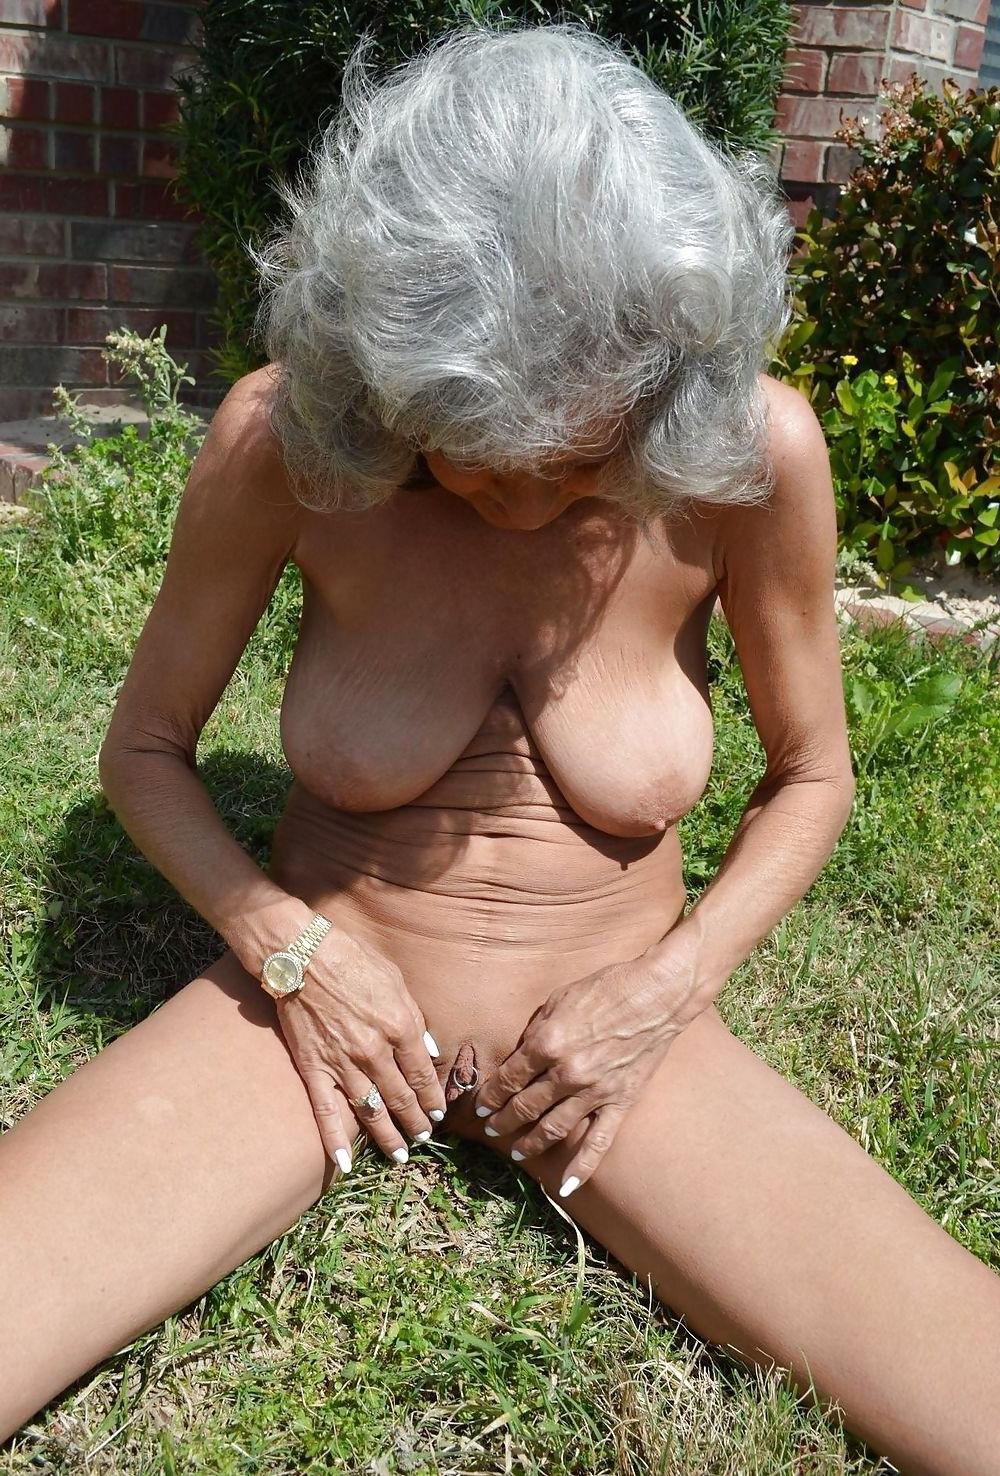 Hot Women Masturbating - Hot women masturbating love porn - grannypornpic.com